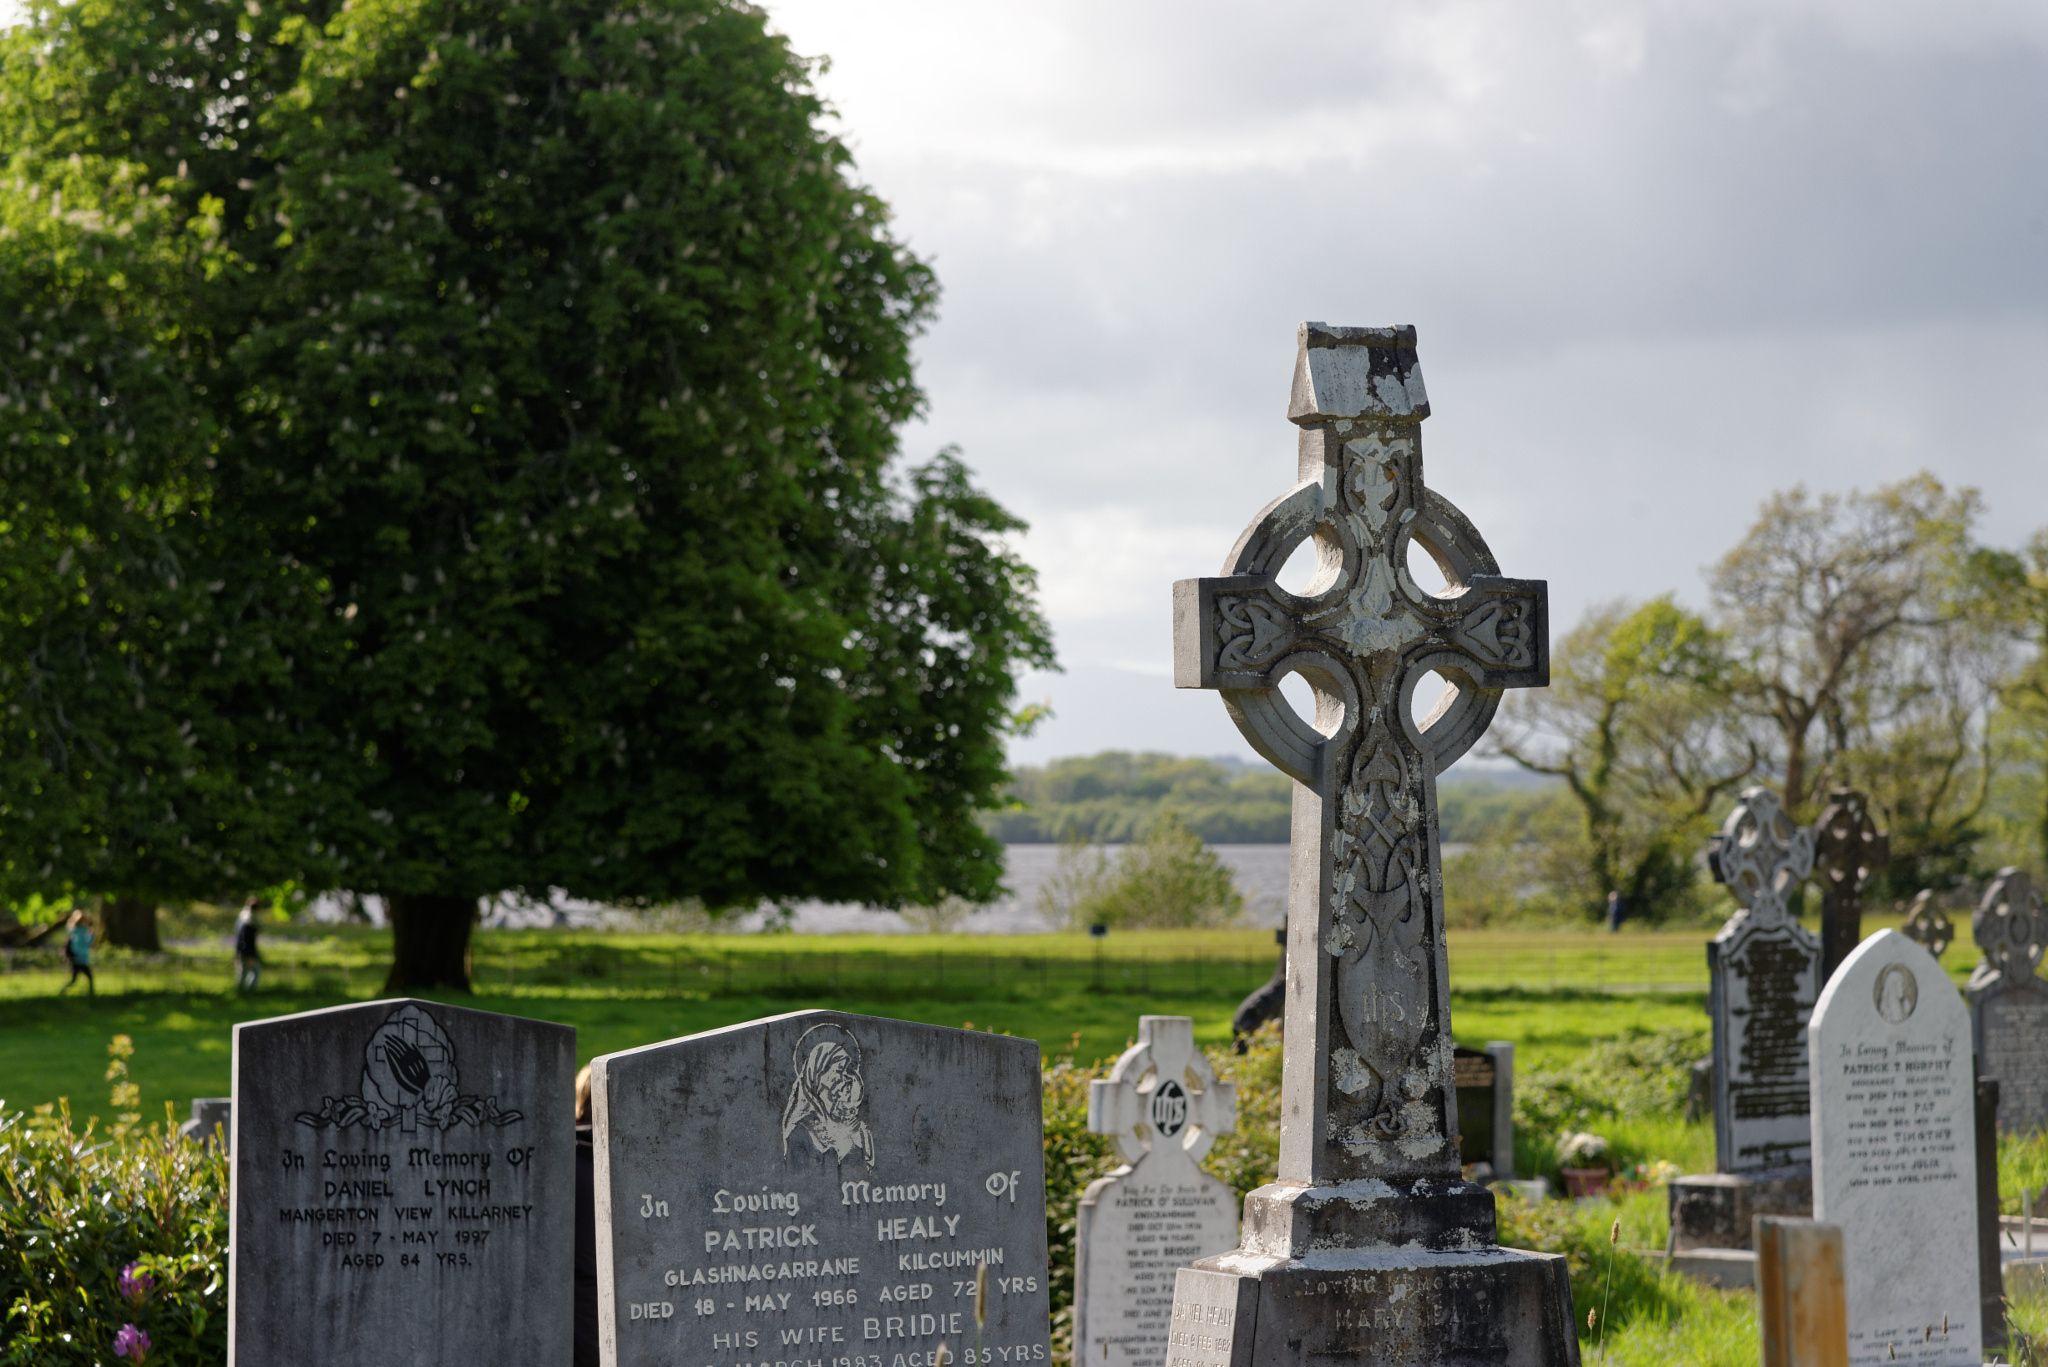 Killarney, Muckross Kloster, Friedhof by Alexander Pöschel (Poeschel) on 500px